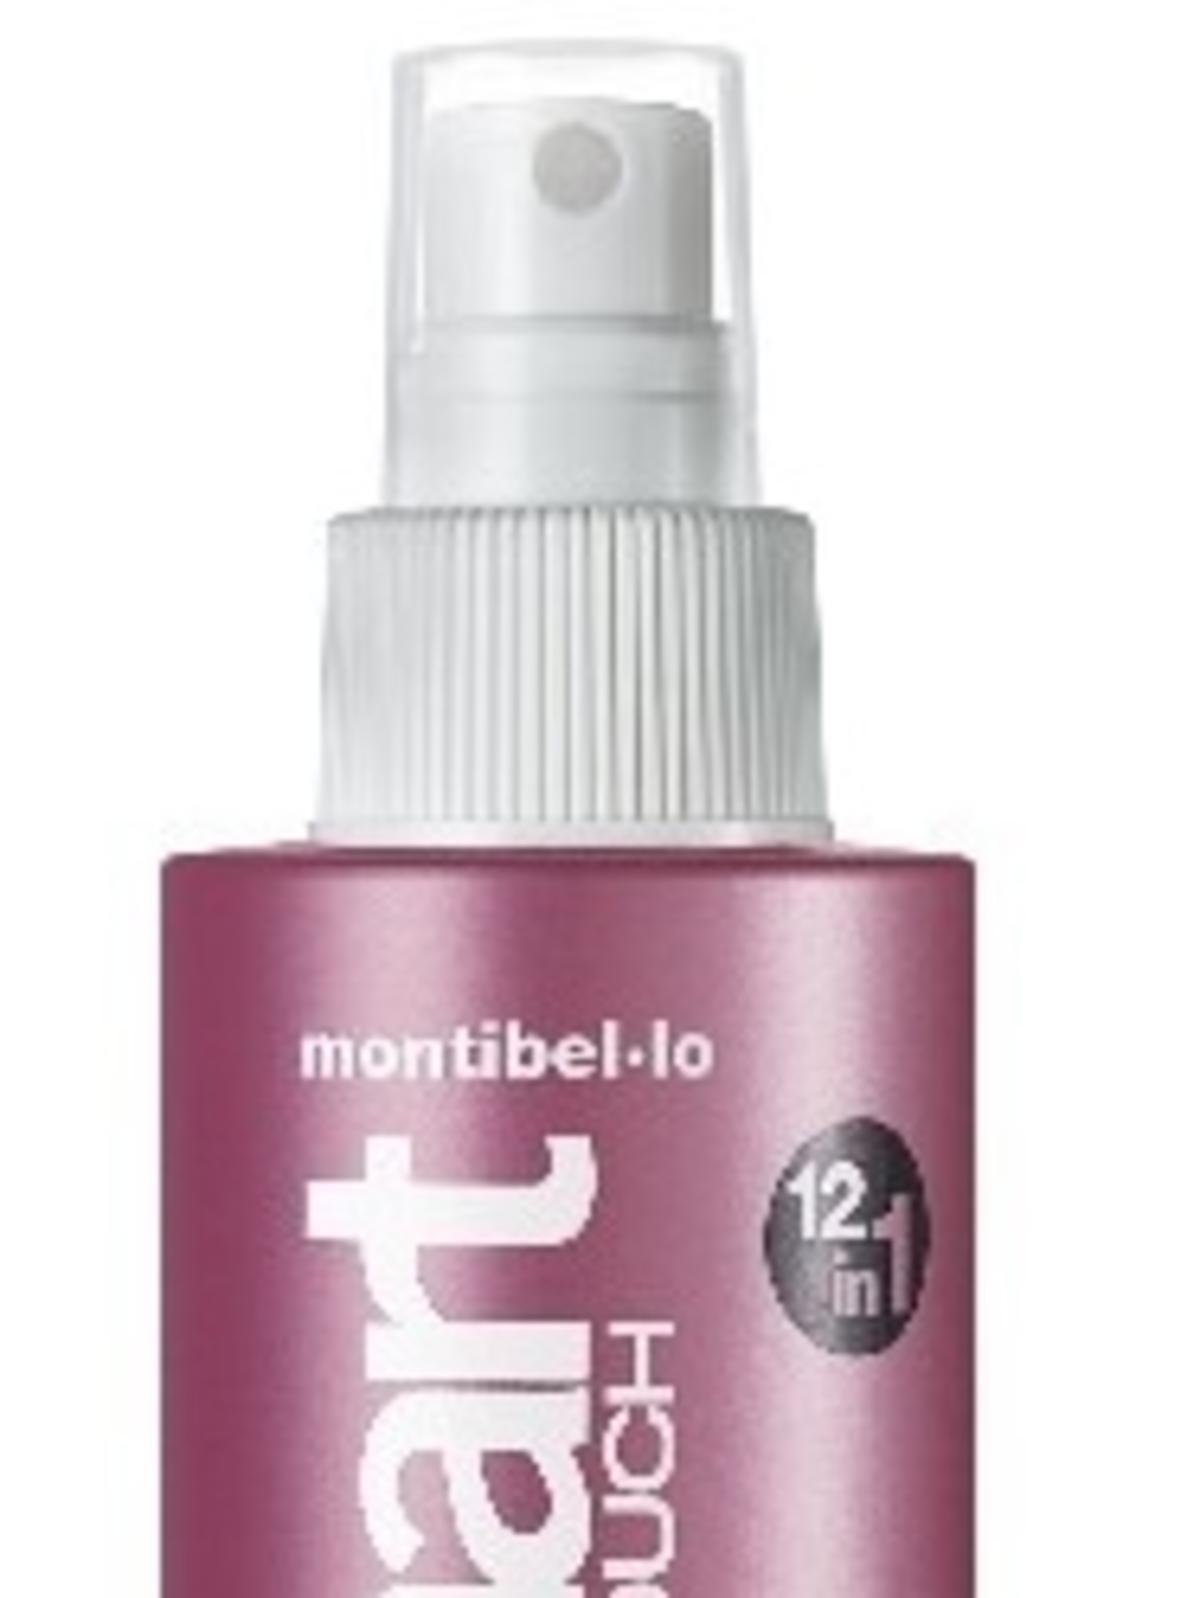 Montibello Smart Touch, 12 in 1 Treatment